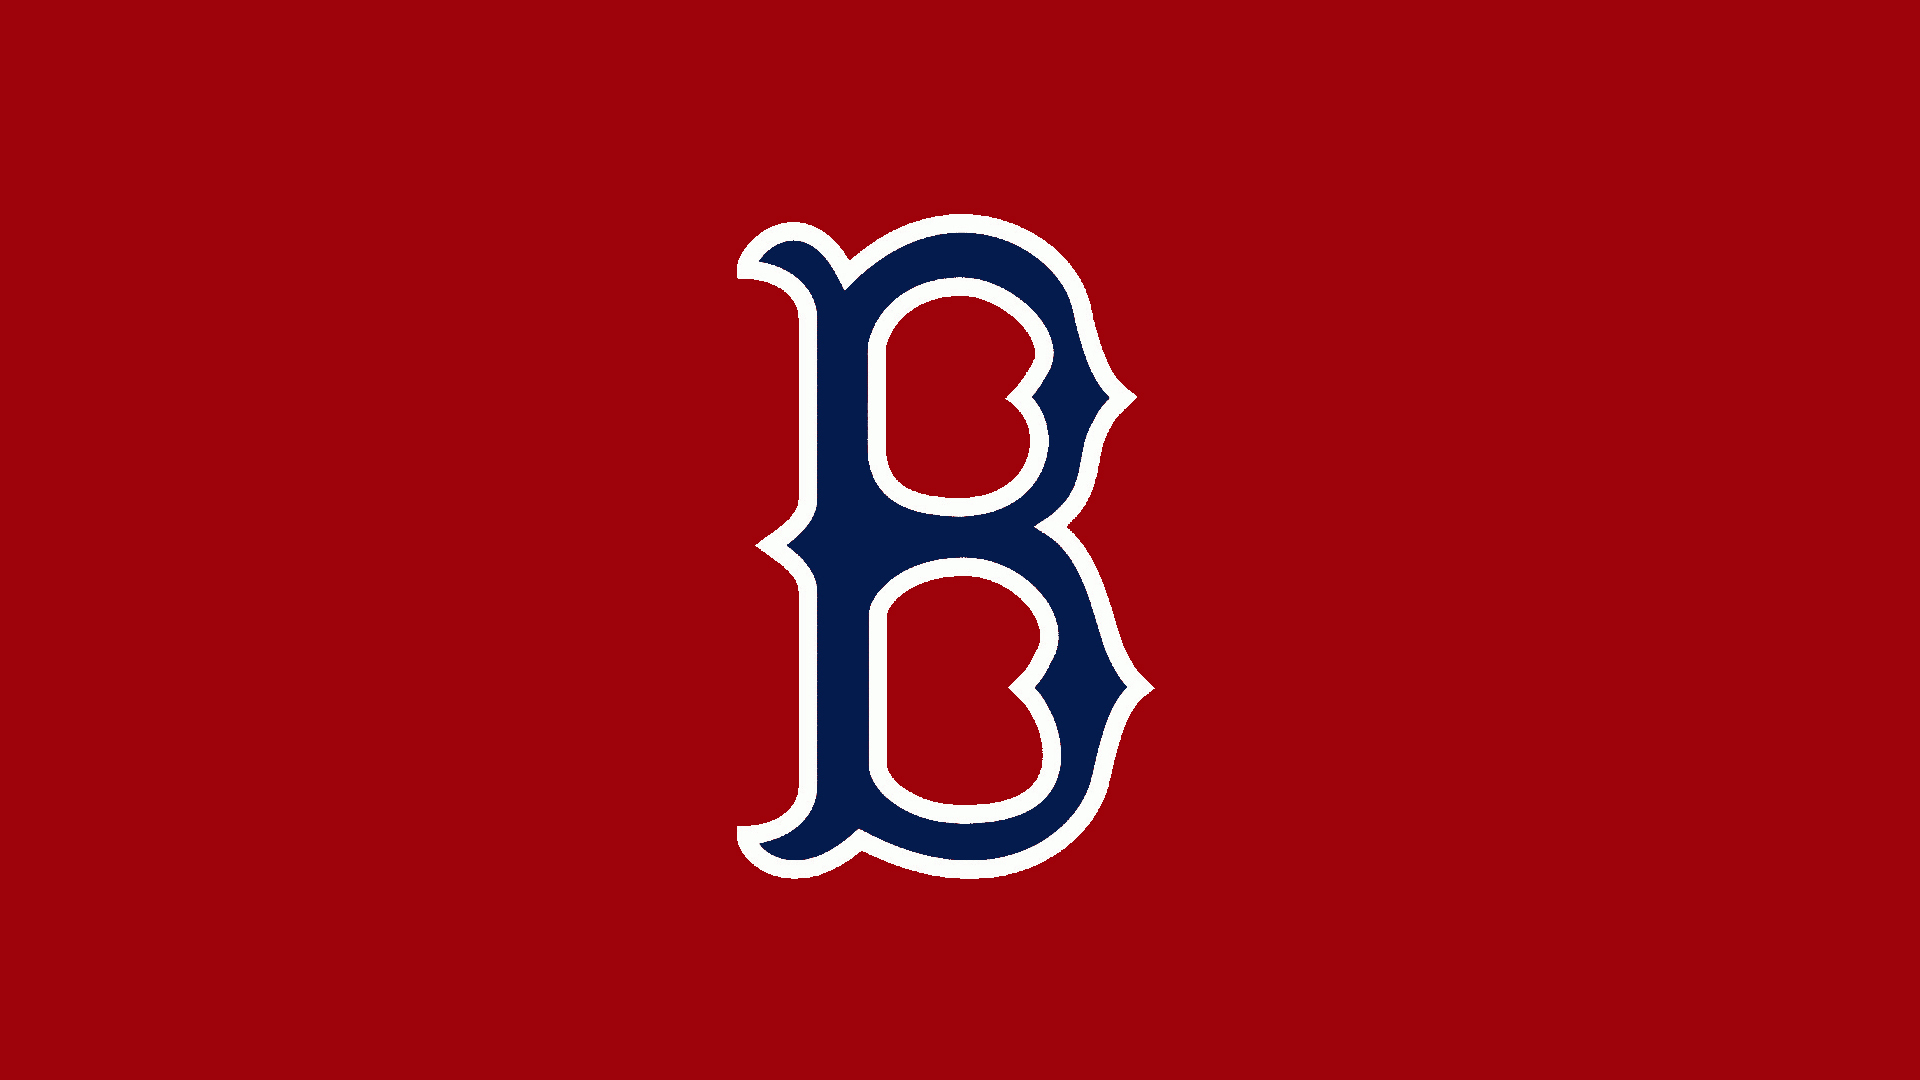 Fullsize Of Red Sox Wallpaper